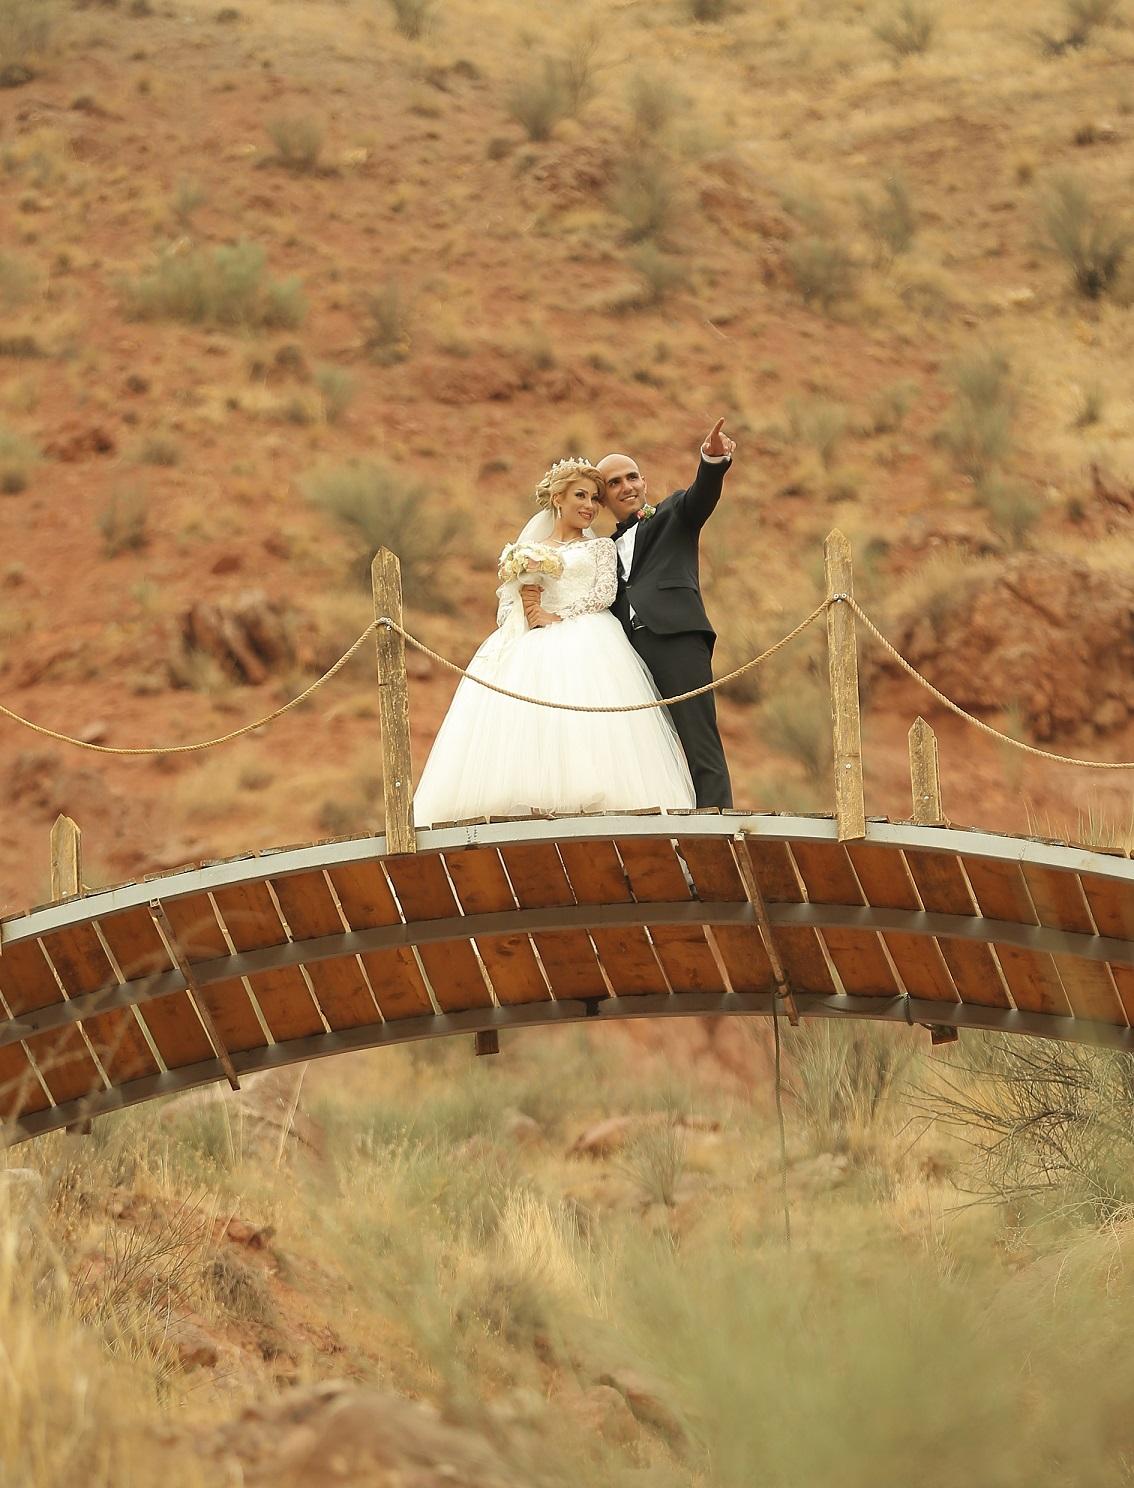 آتلیه عکس و فیلم سرو | عروس داماد روی پل